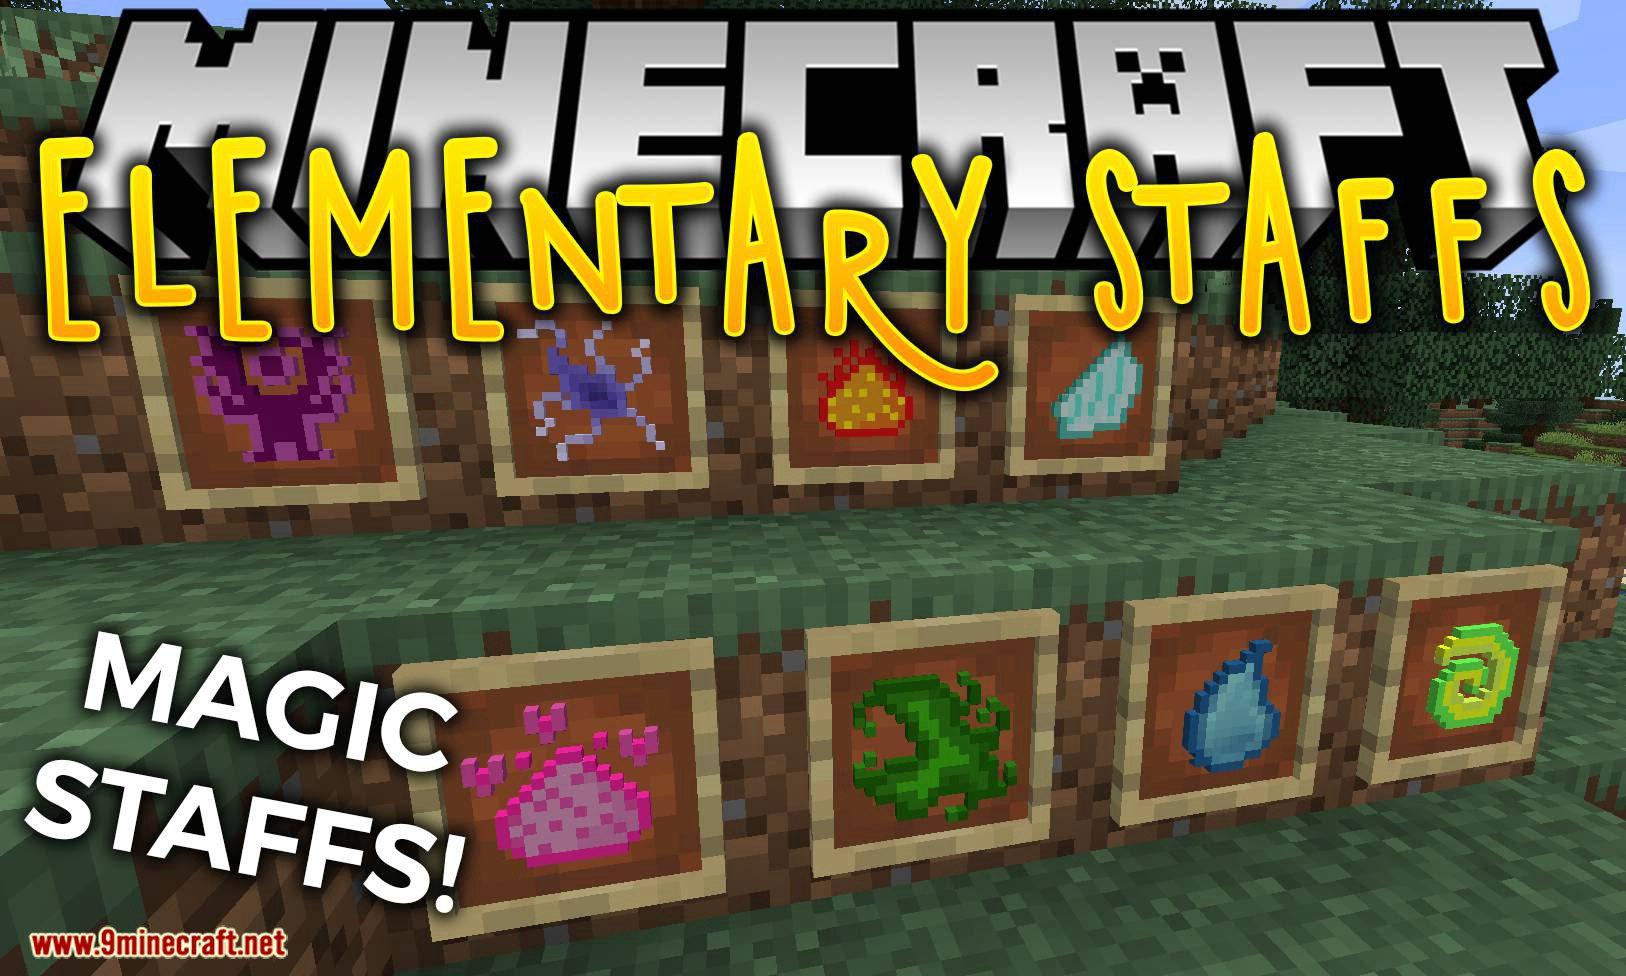 Elementary Staffs mod for minecraft logo